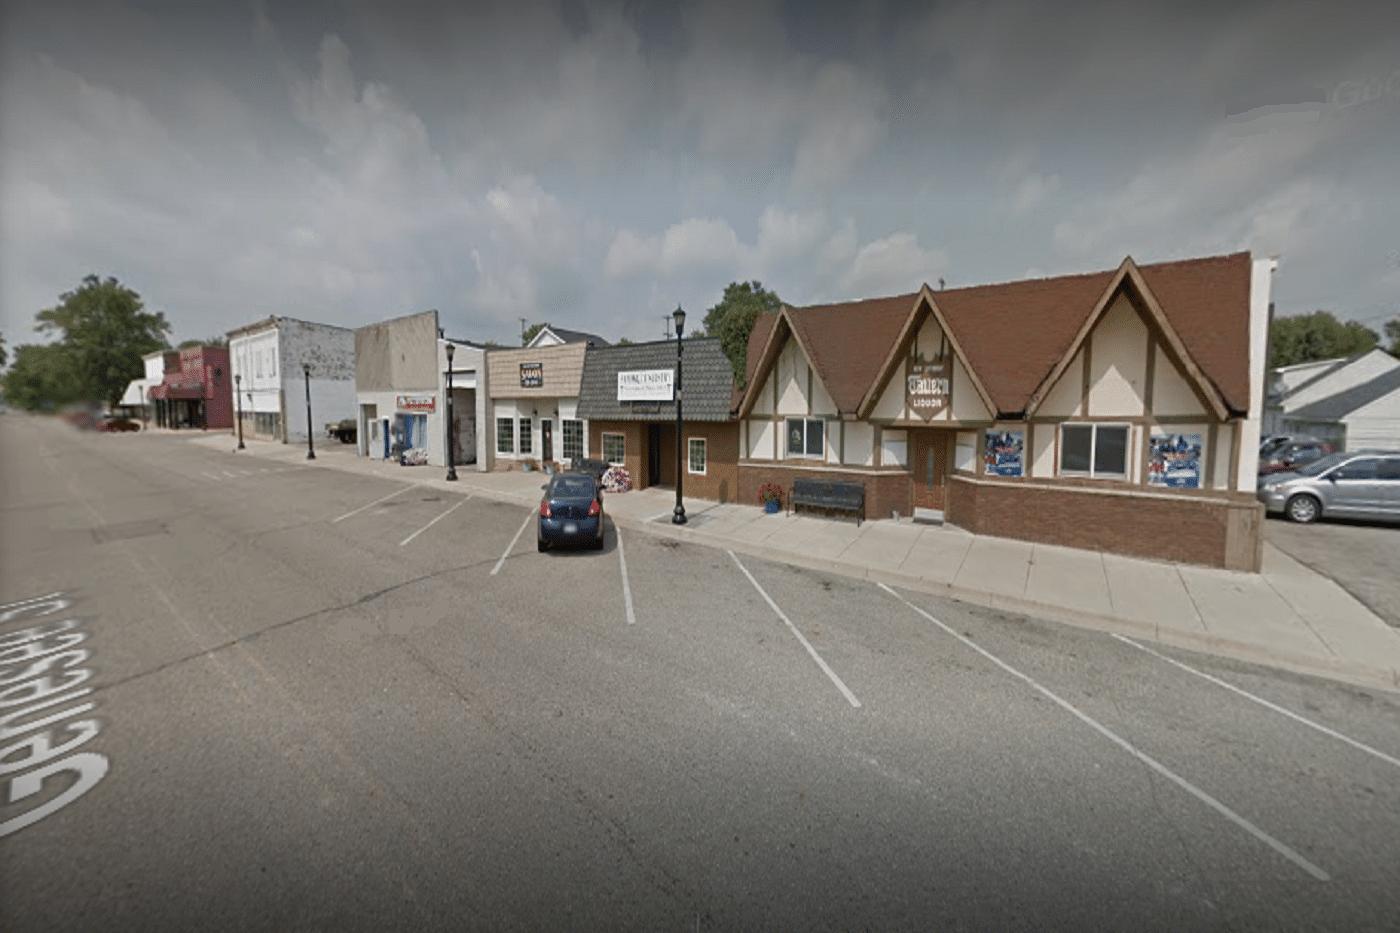 Lothrop Tavern, 9513 Genesee St, New Lothrop, MI 48460 was fined $900 by the Michigan Liquor Control Board